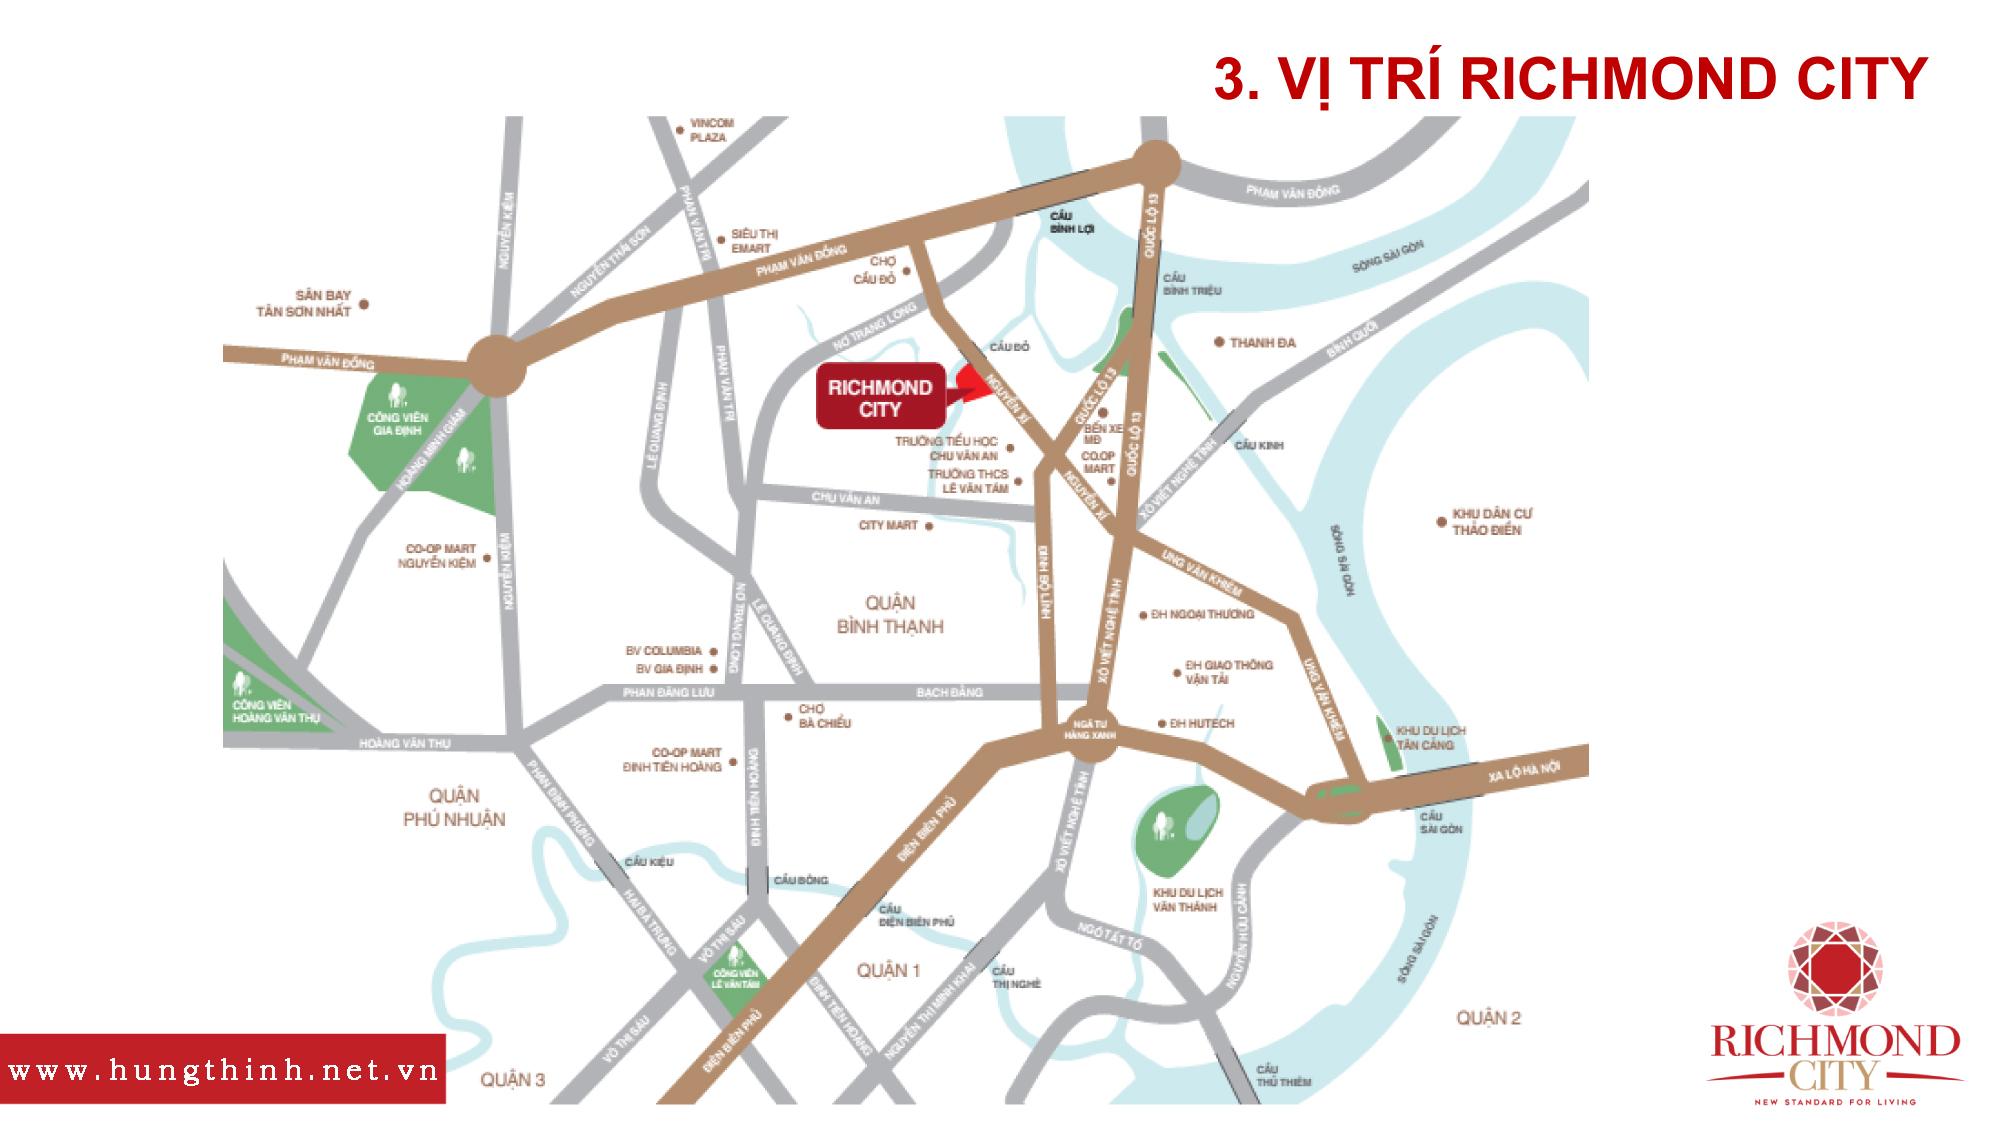 Vị trí căn hộ Richmond city